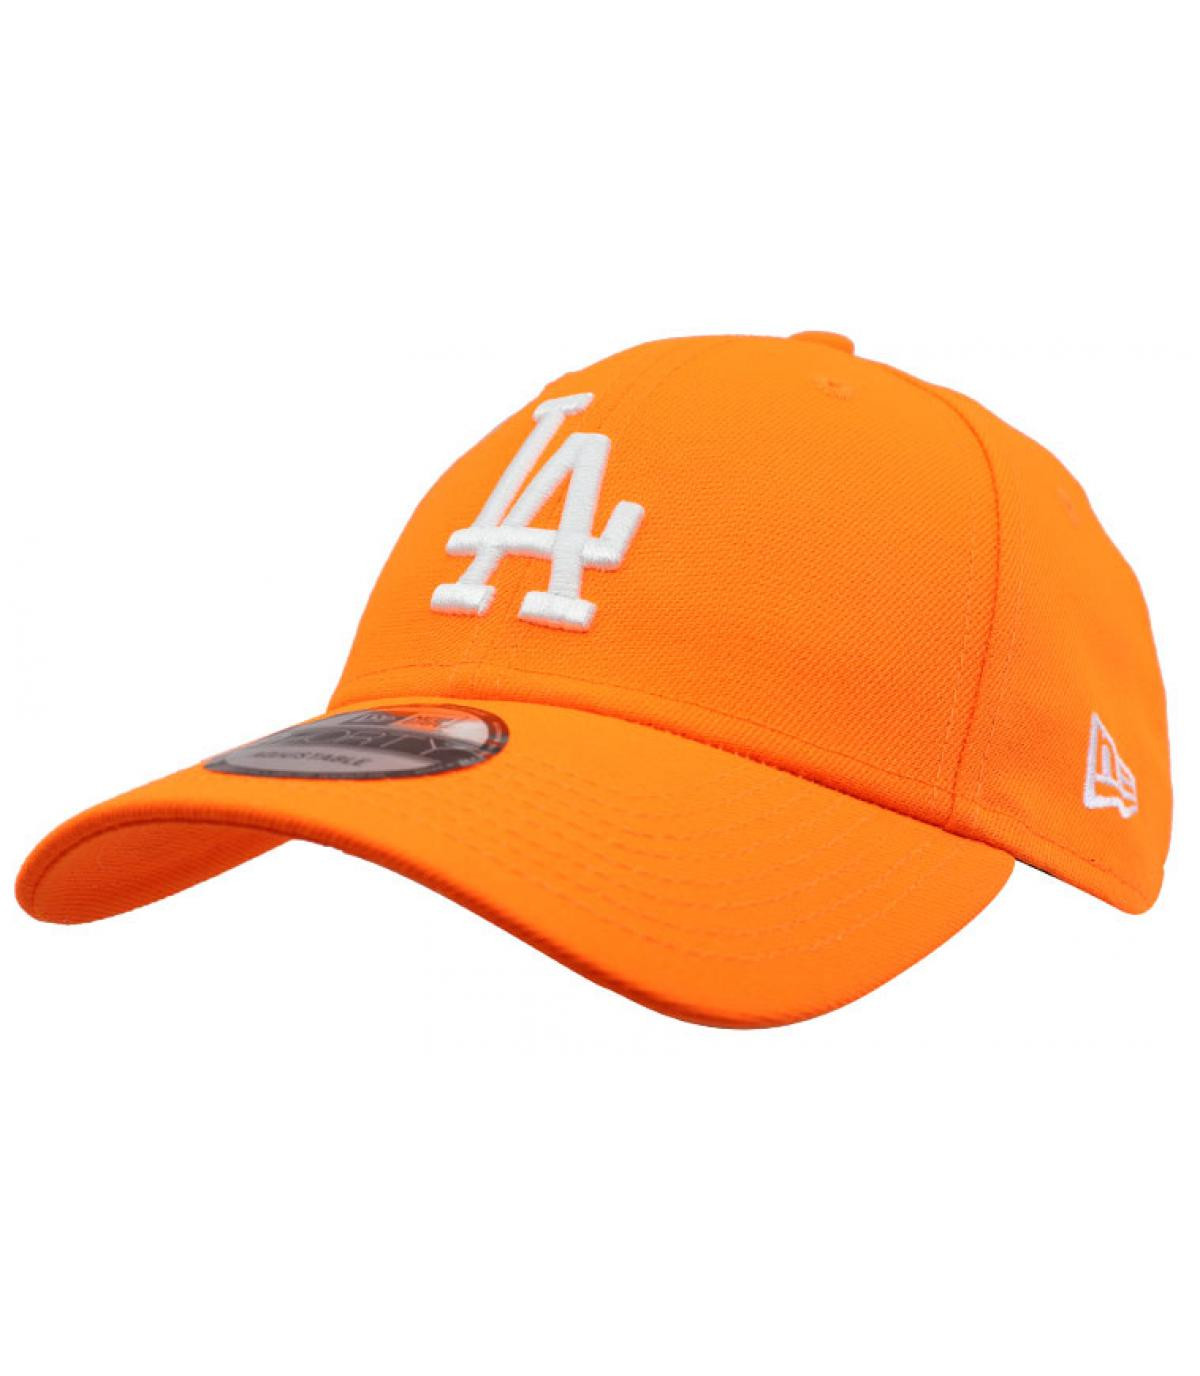 casquette LA orange fluo